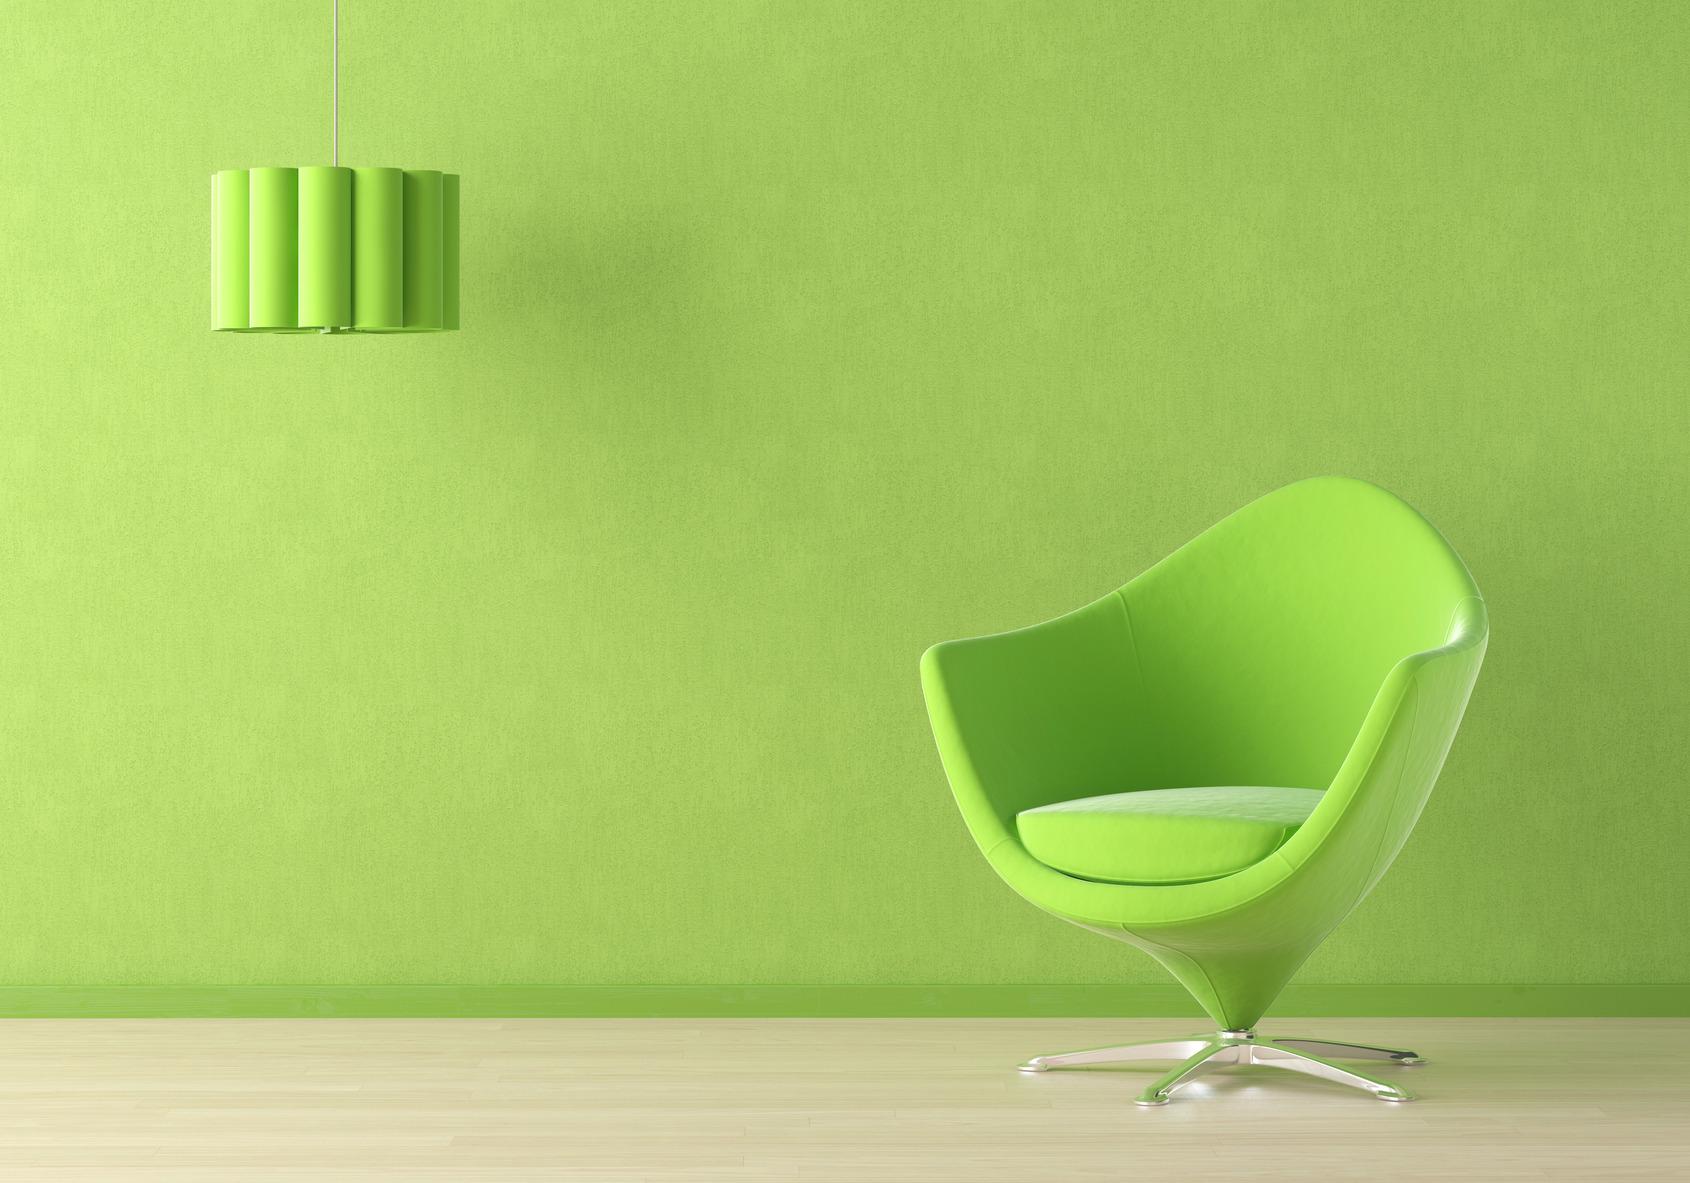 Beau Green Interior Scene